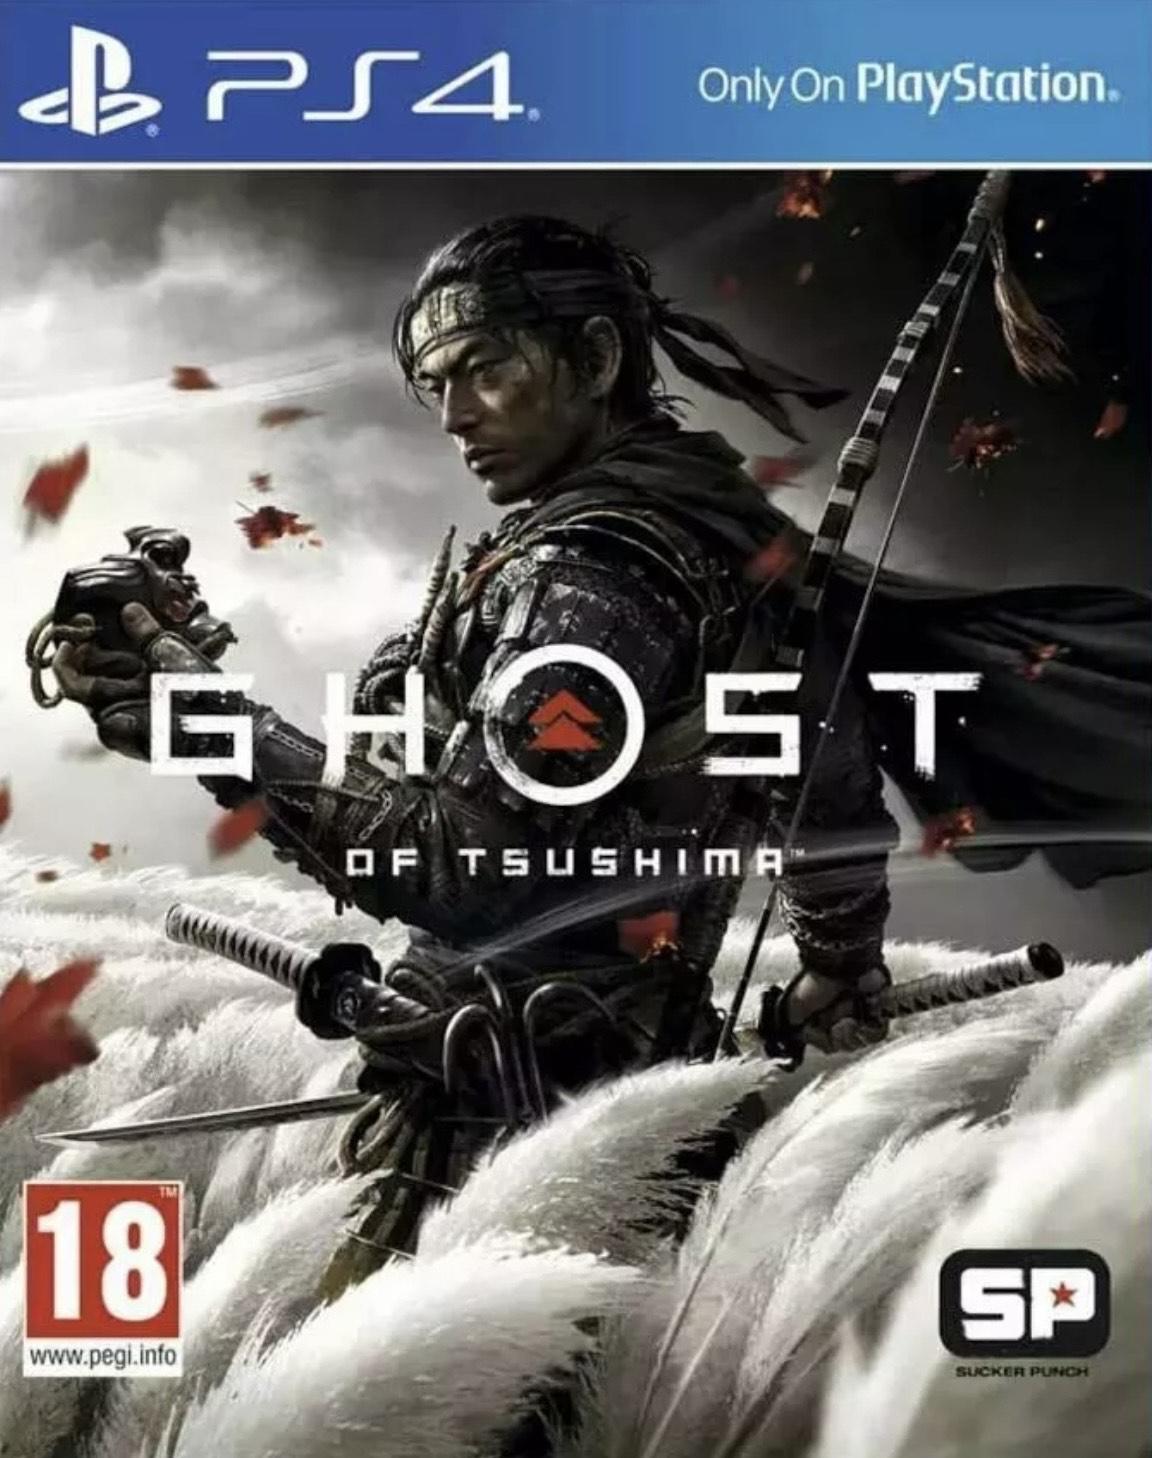 Ghost Of Tsushima (PS4) Ex rental £29.99 @ boomerangrentals via eBay